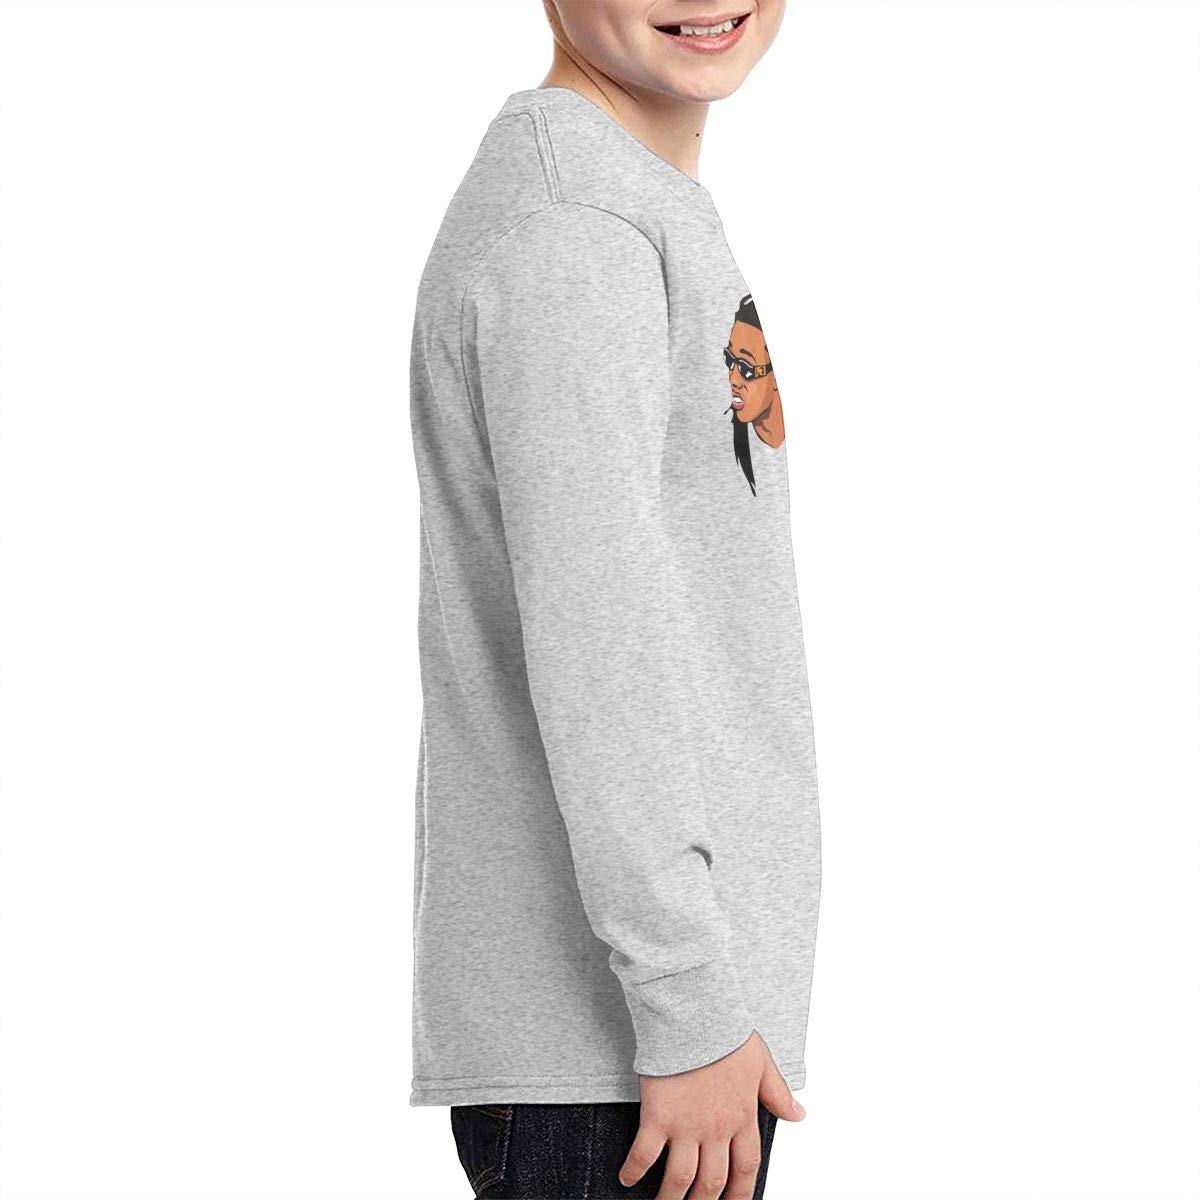 TWOSKILL Youth Hip Hop-Migos Long Sleeves Shirt Boys Girls